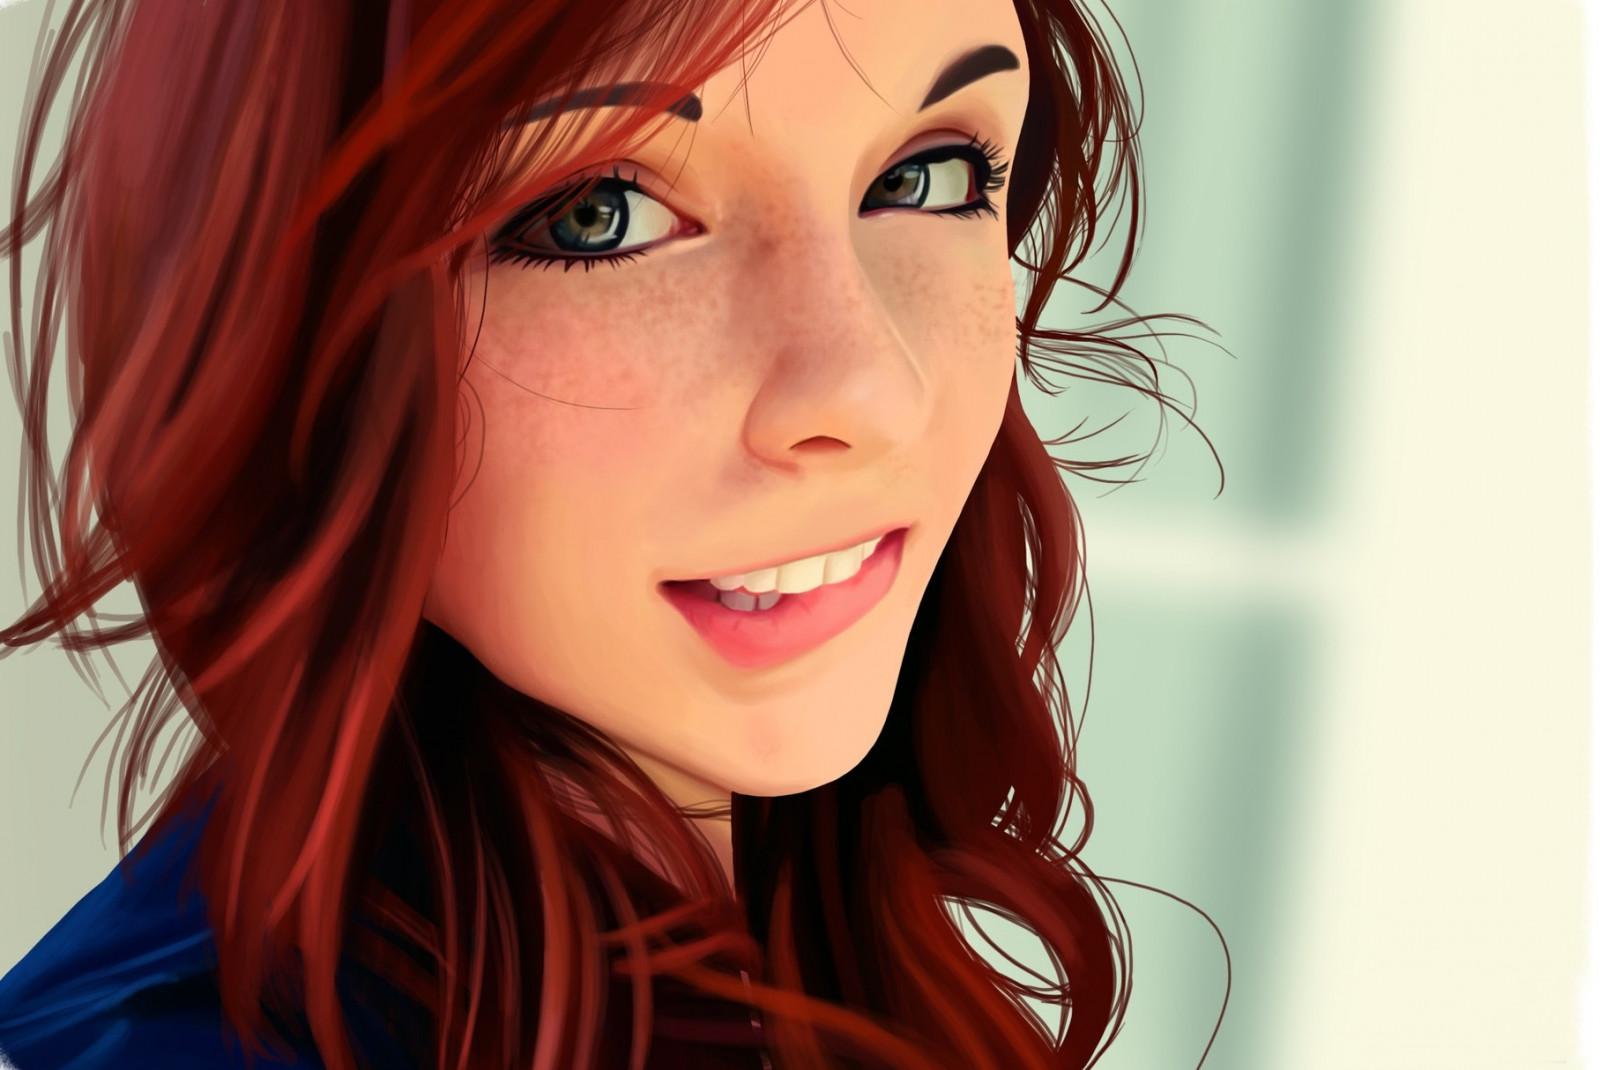 Красивая девушка арт фото